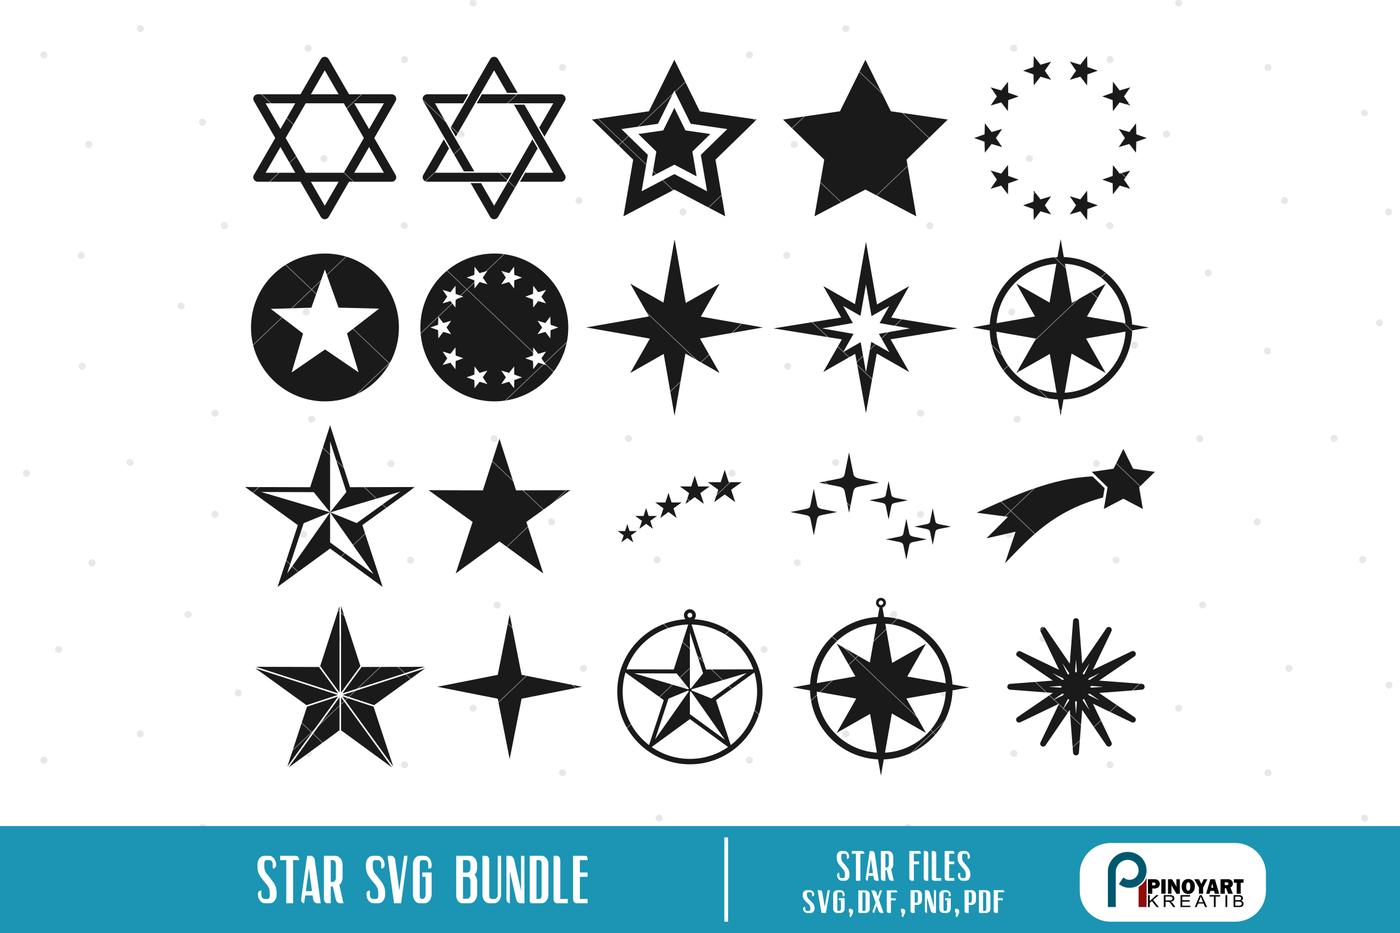 Star Svg Shooting Star Svg Christmas Star Svg Svg Files For